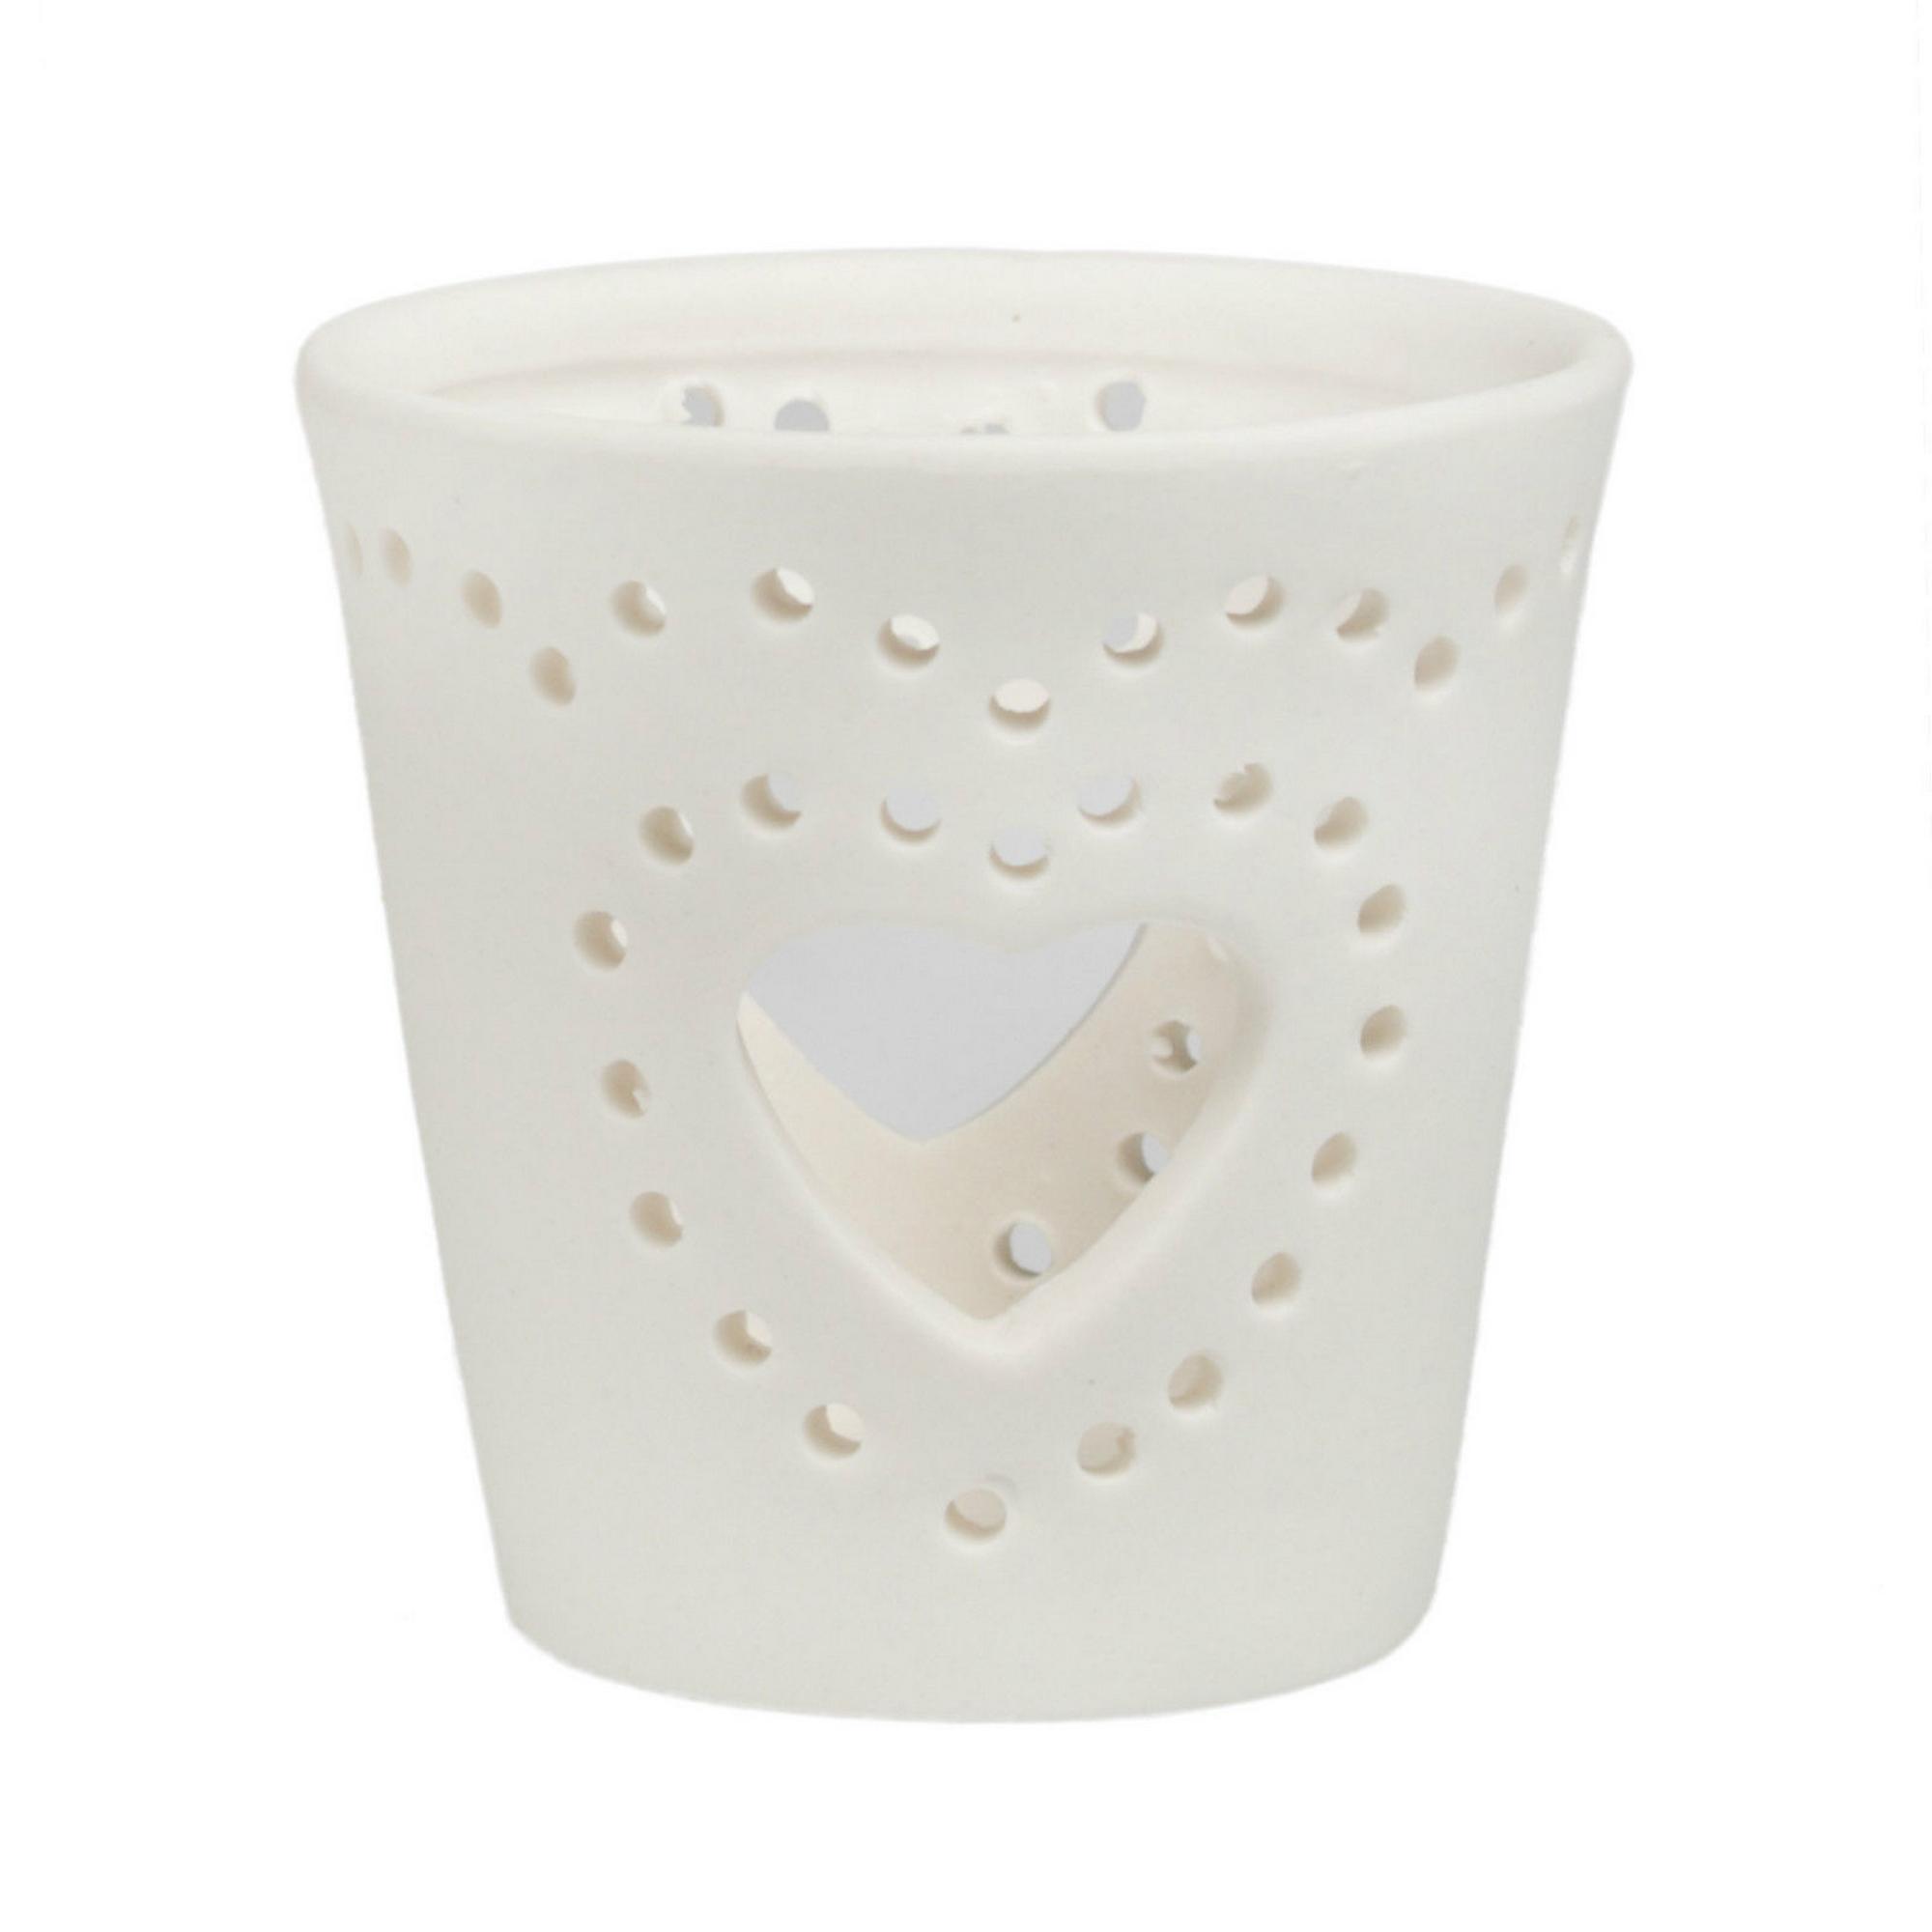 Big Heart White Ceramic Tea Light Holder Blendboutique